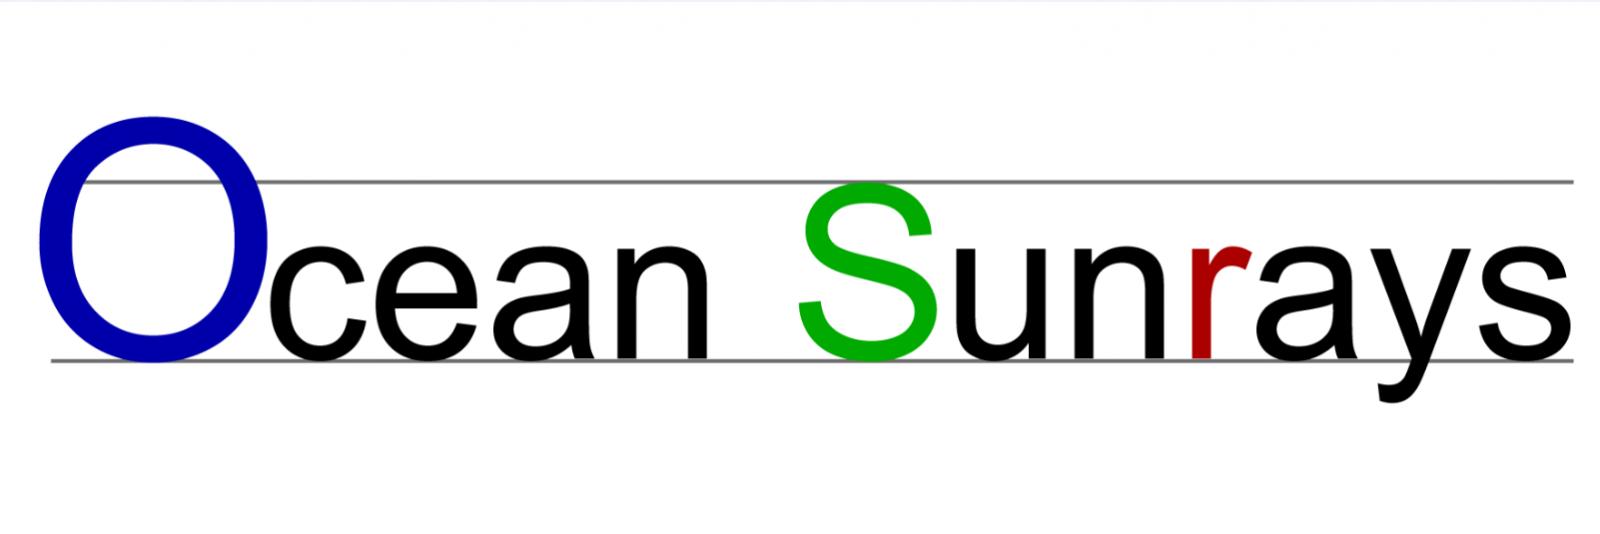 Ocean Sunrays Inc.